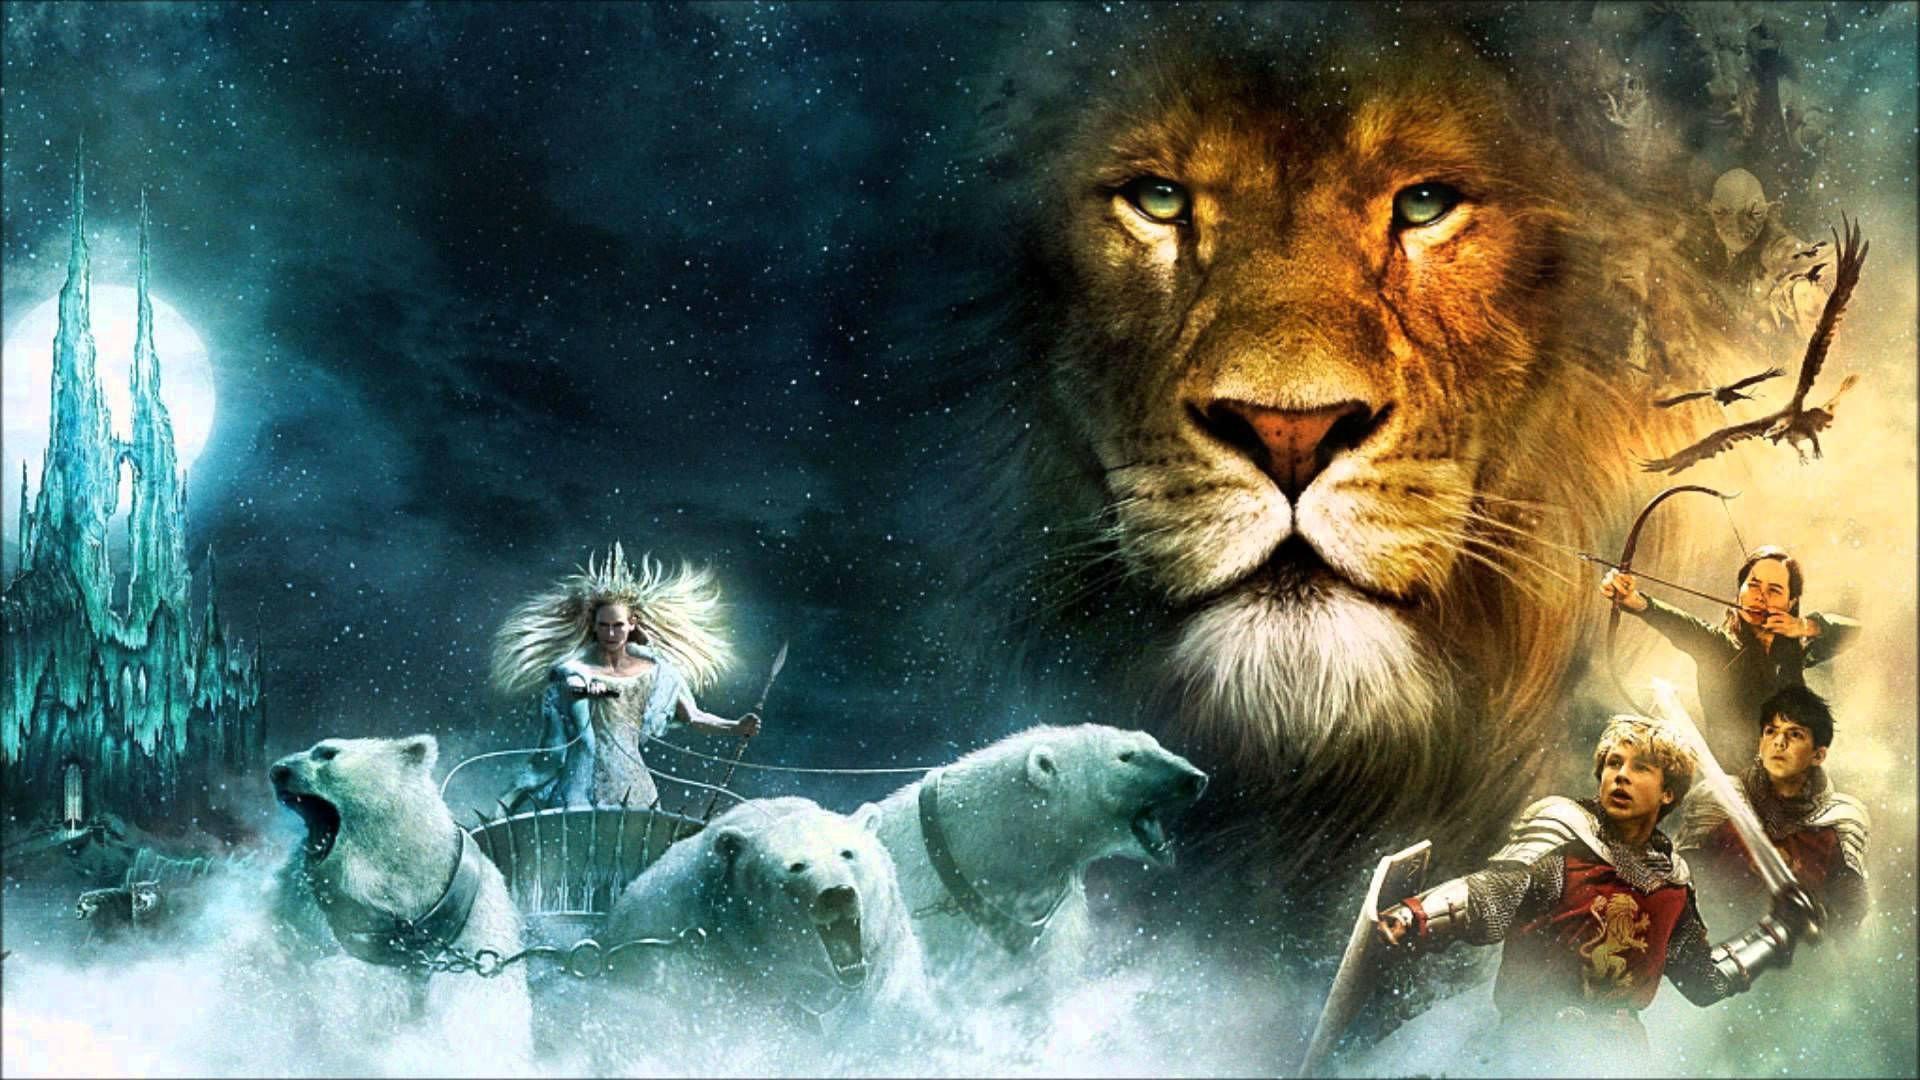 66 Narnia Aslan Wallpapers on WallpaperPlay 1920x1080